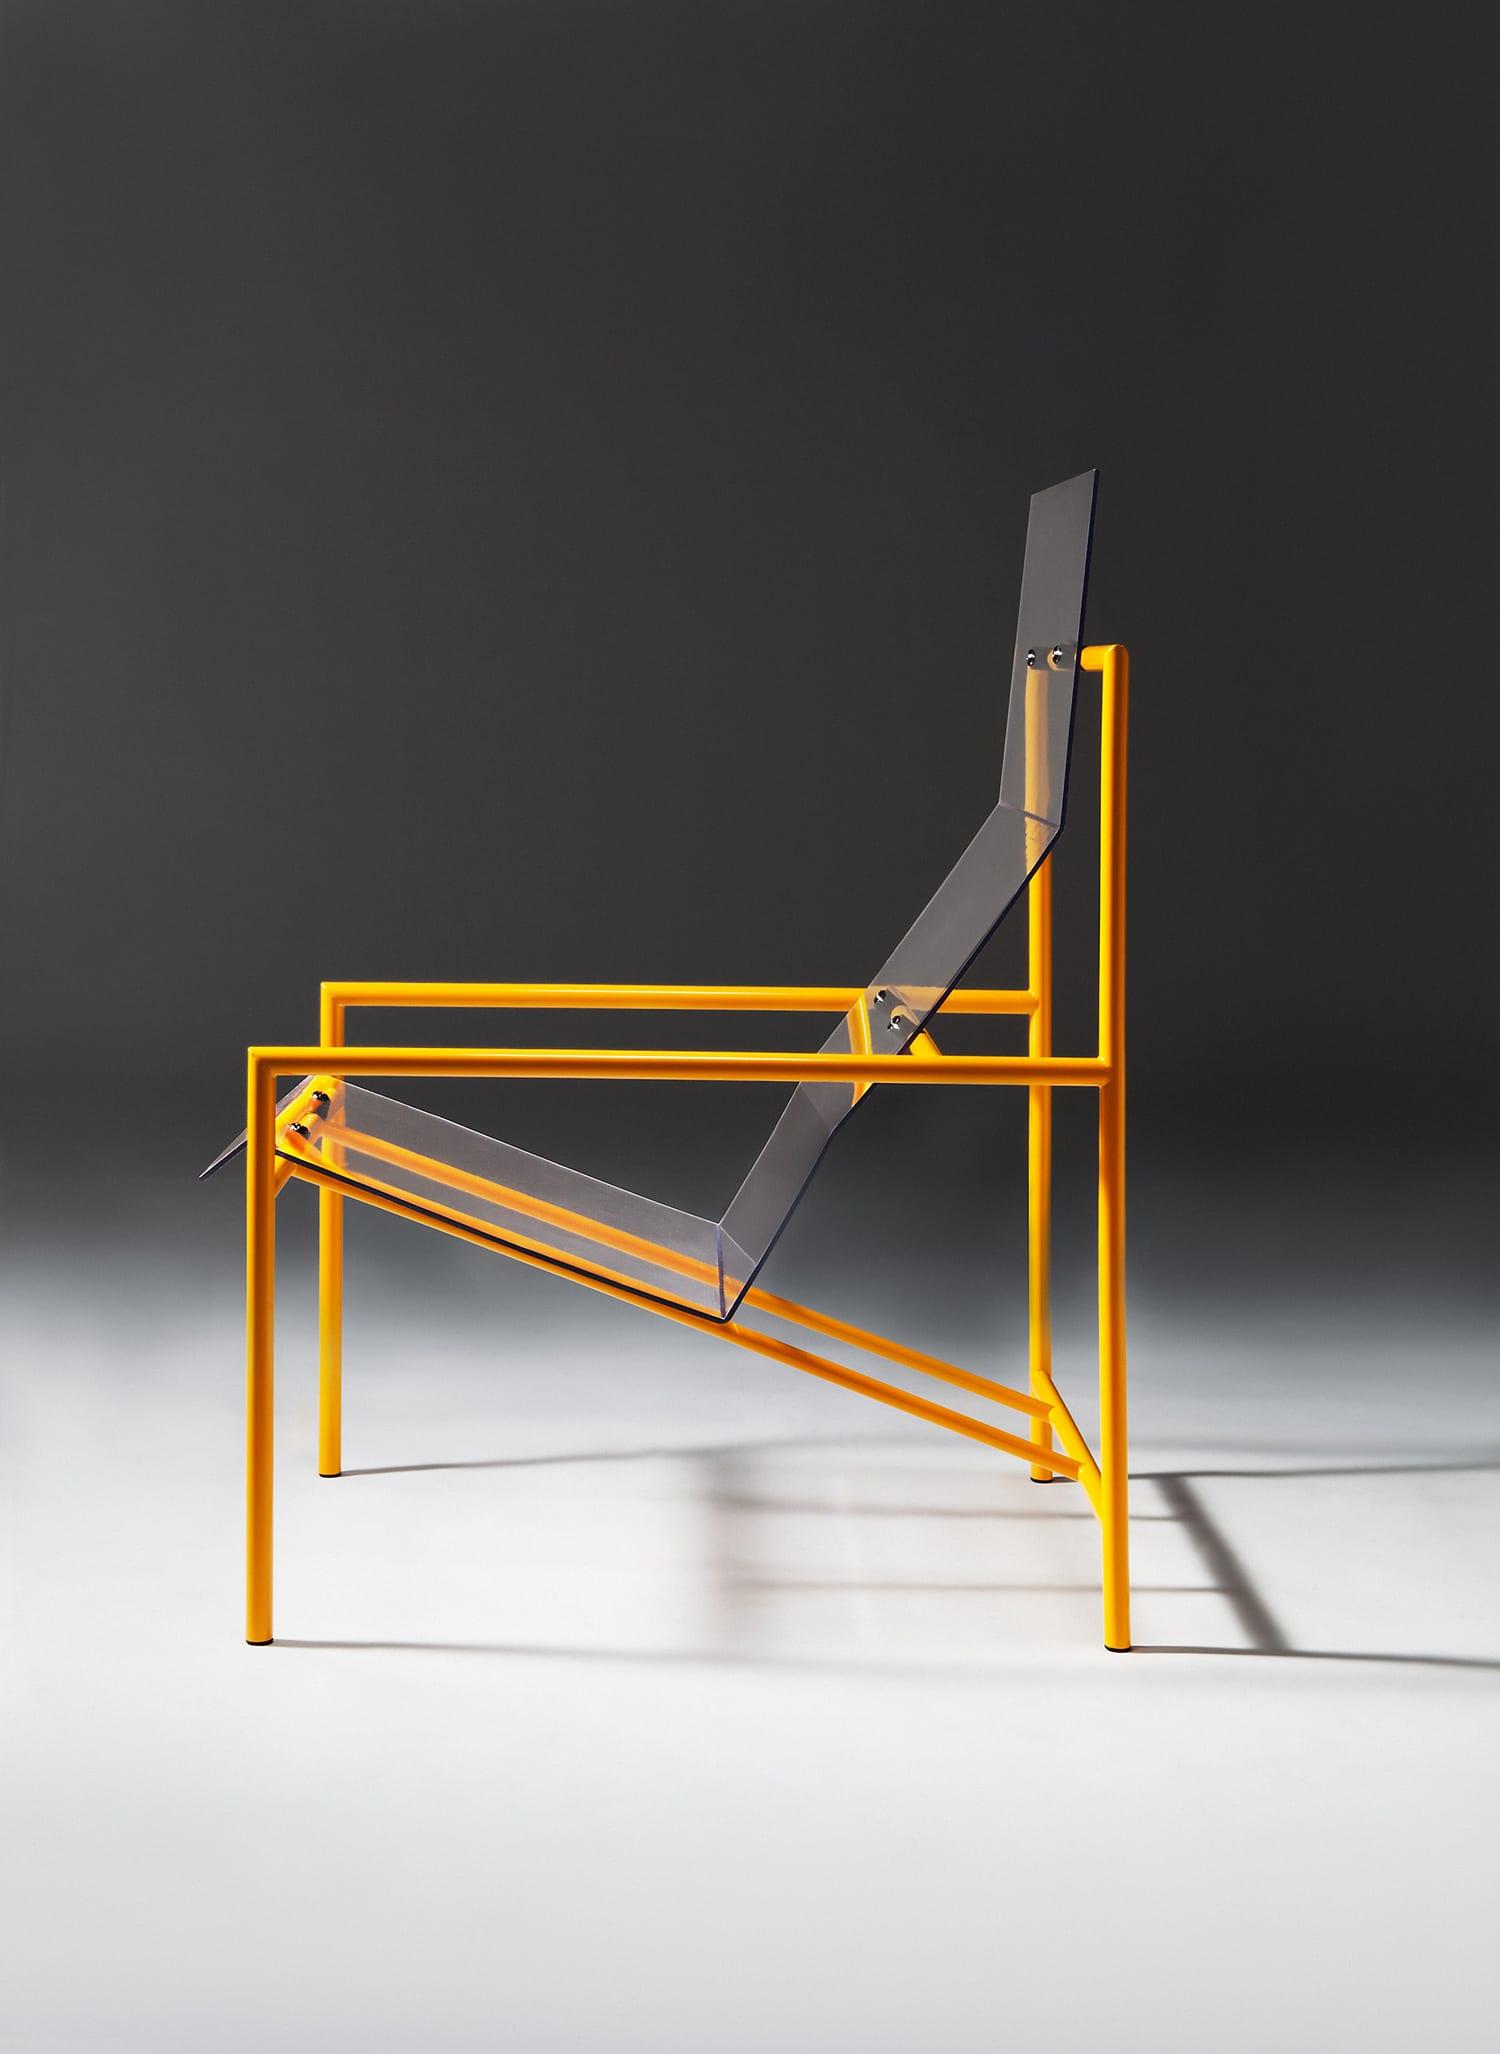 Nirvana Aalto University Students at Stockholm Furniture Fair 2018 | Yellowtrace